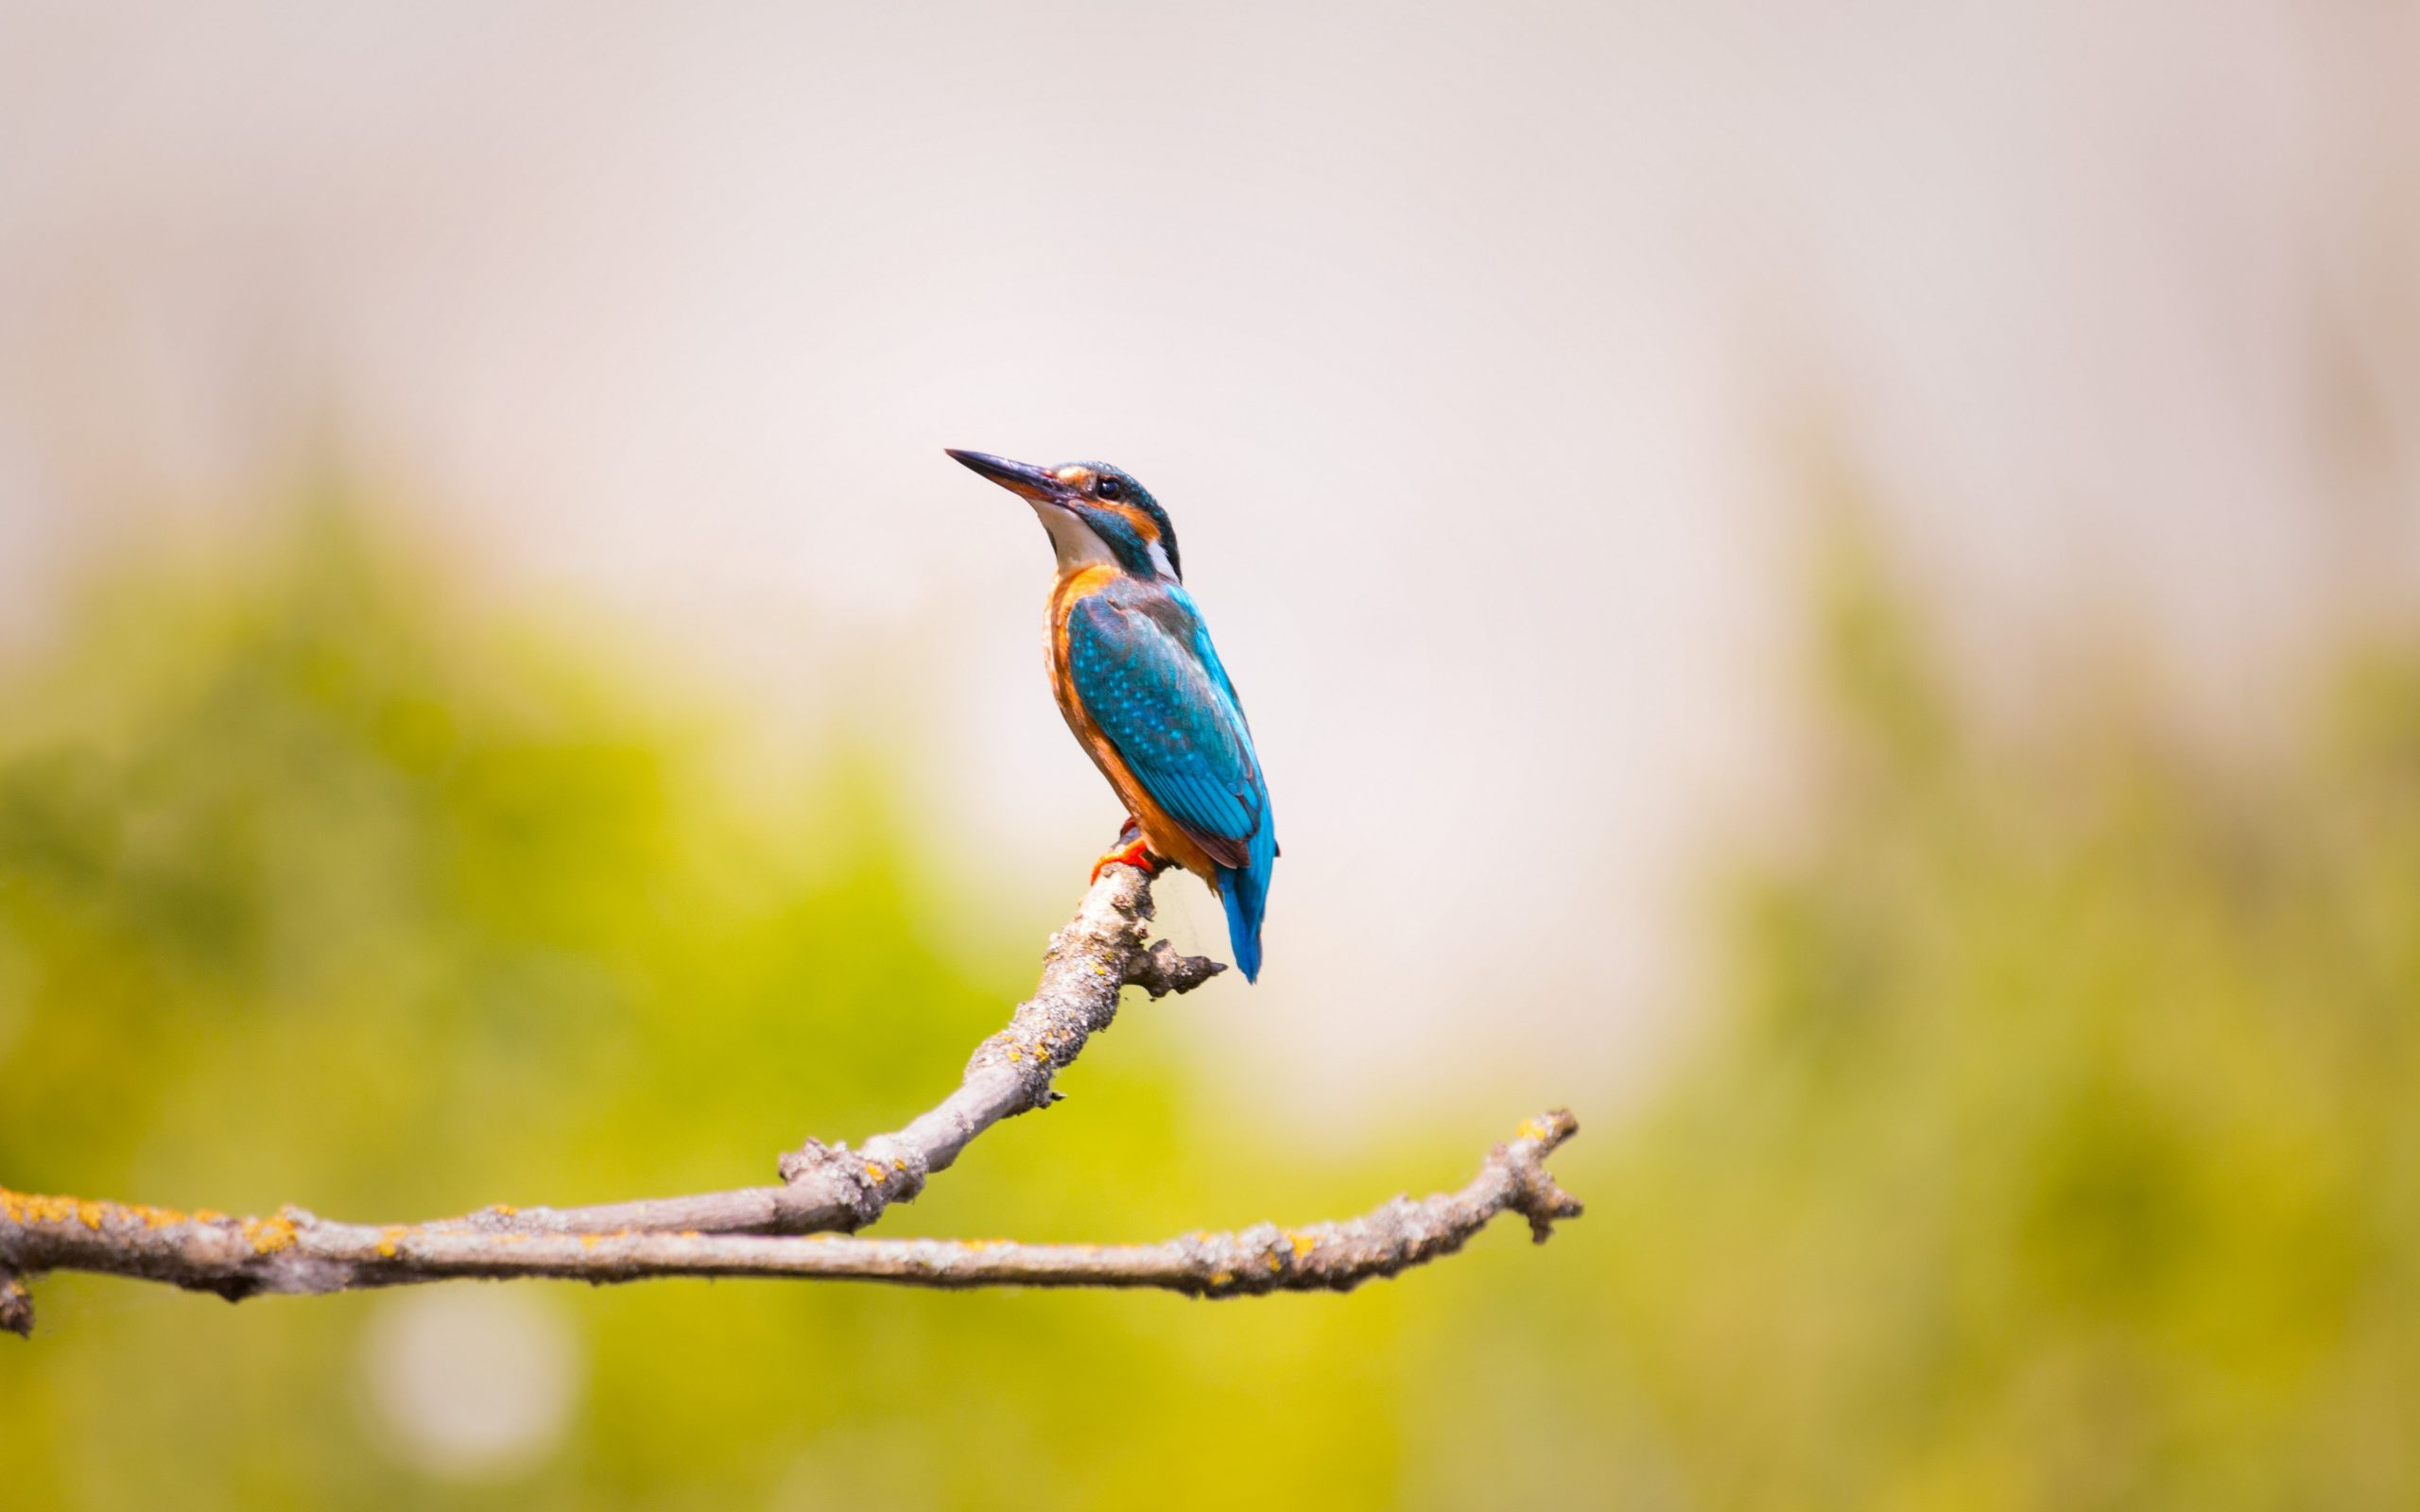 Kingfisher Bird 4k 5k Wallpaper Hd Wallpaper Background